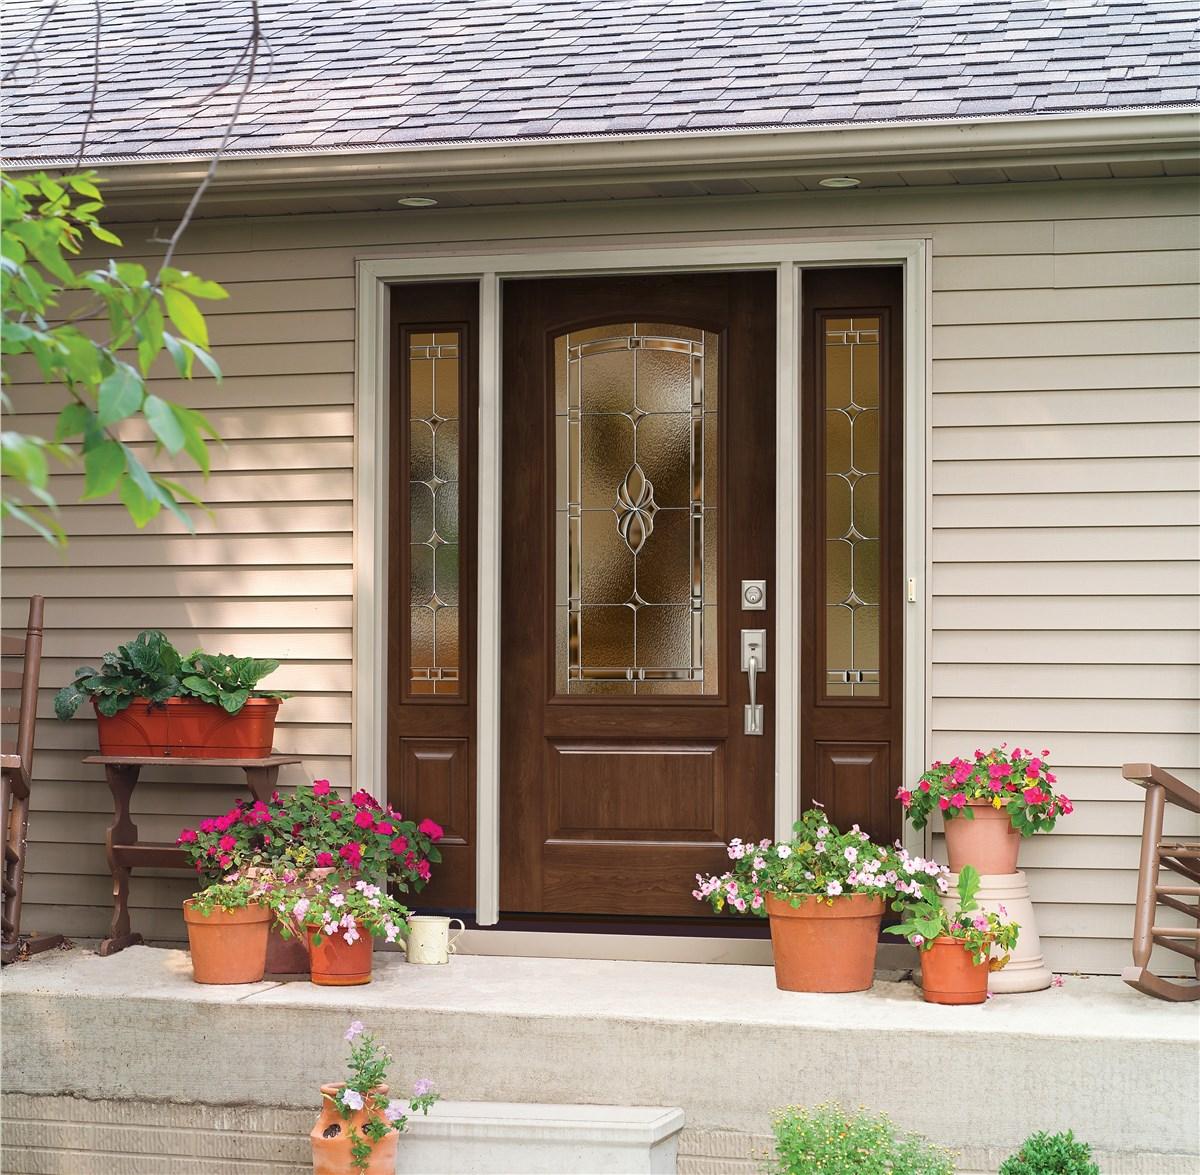 & New England Door Installation | Boston Door Installation | NEWPRO